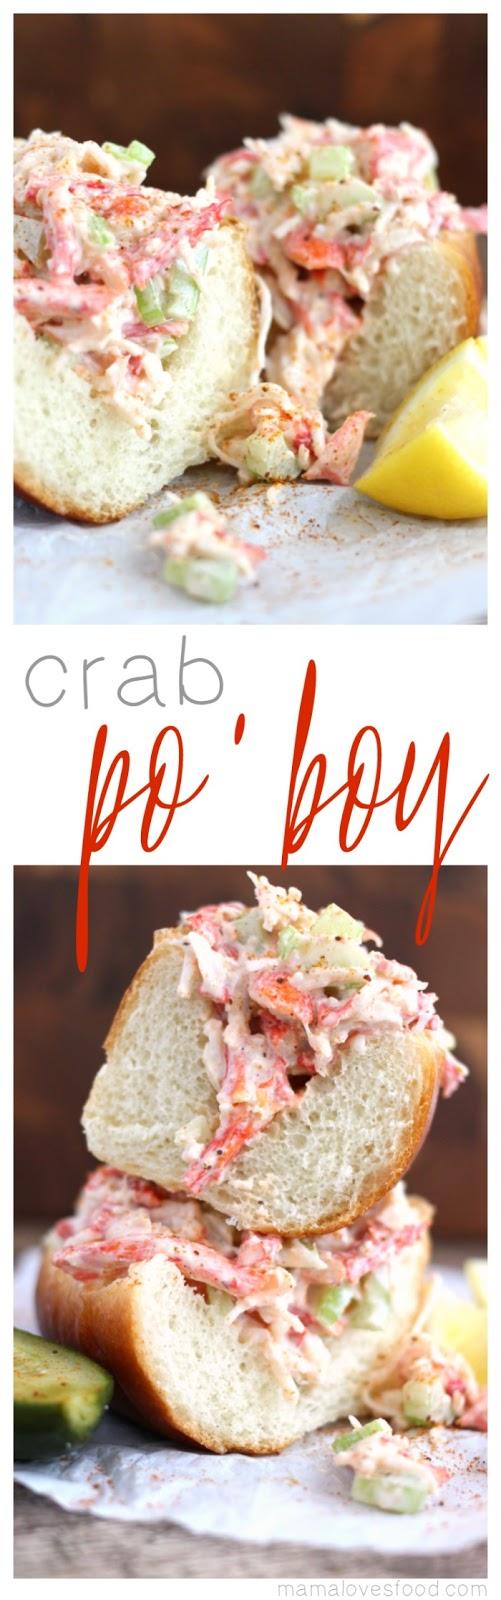 Crab Po'boy Recipe